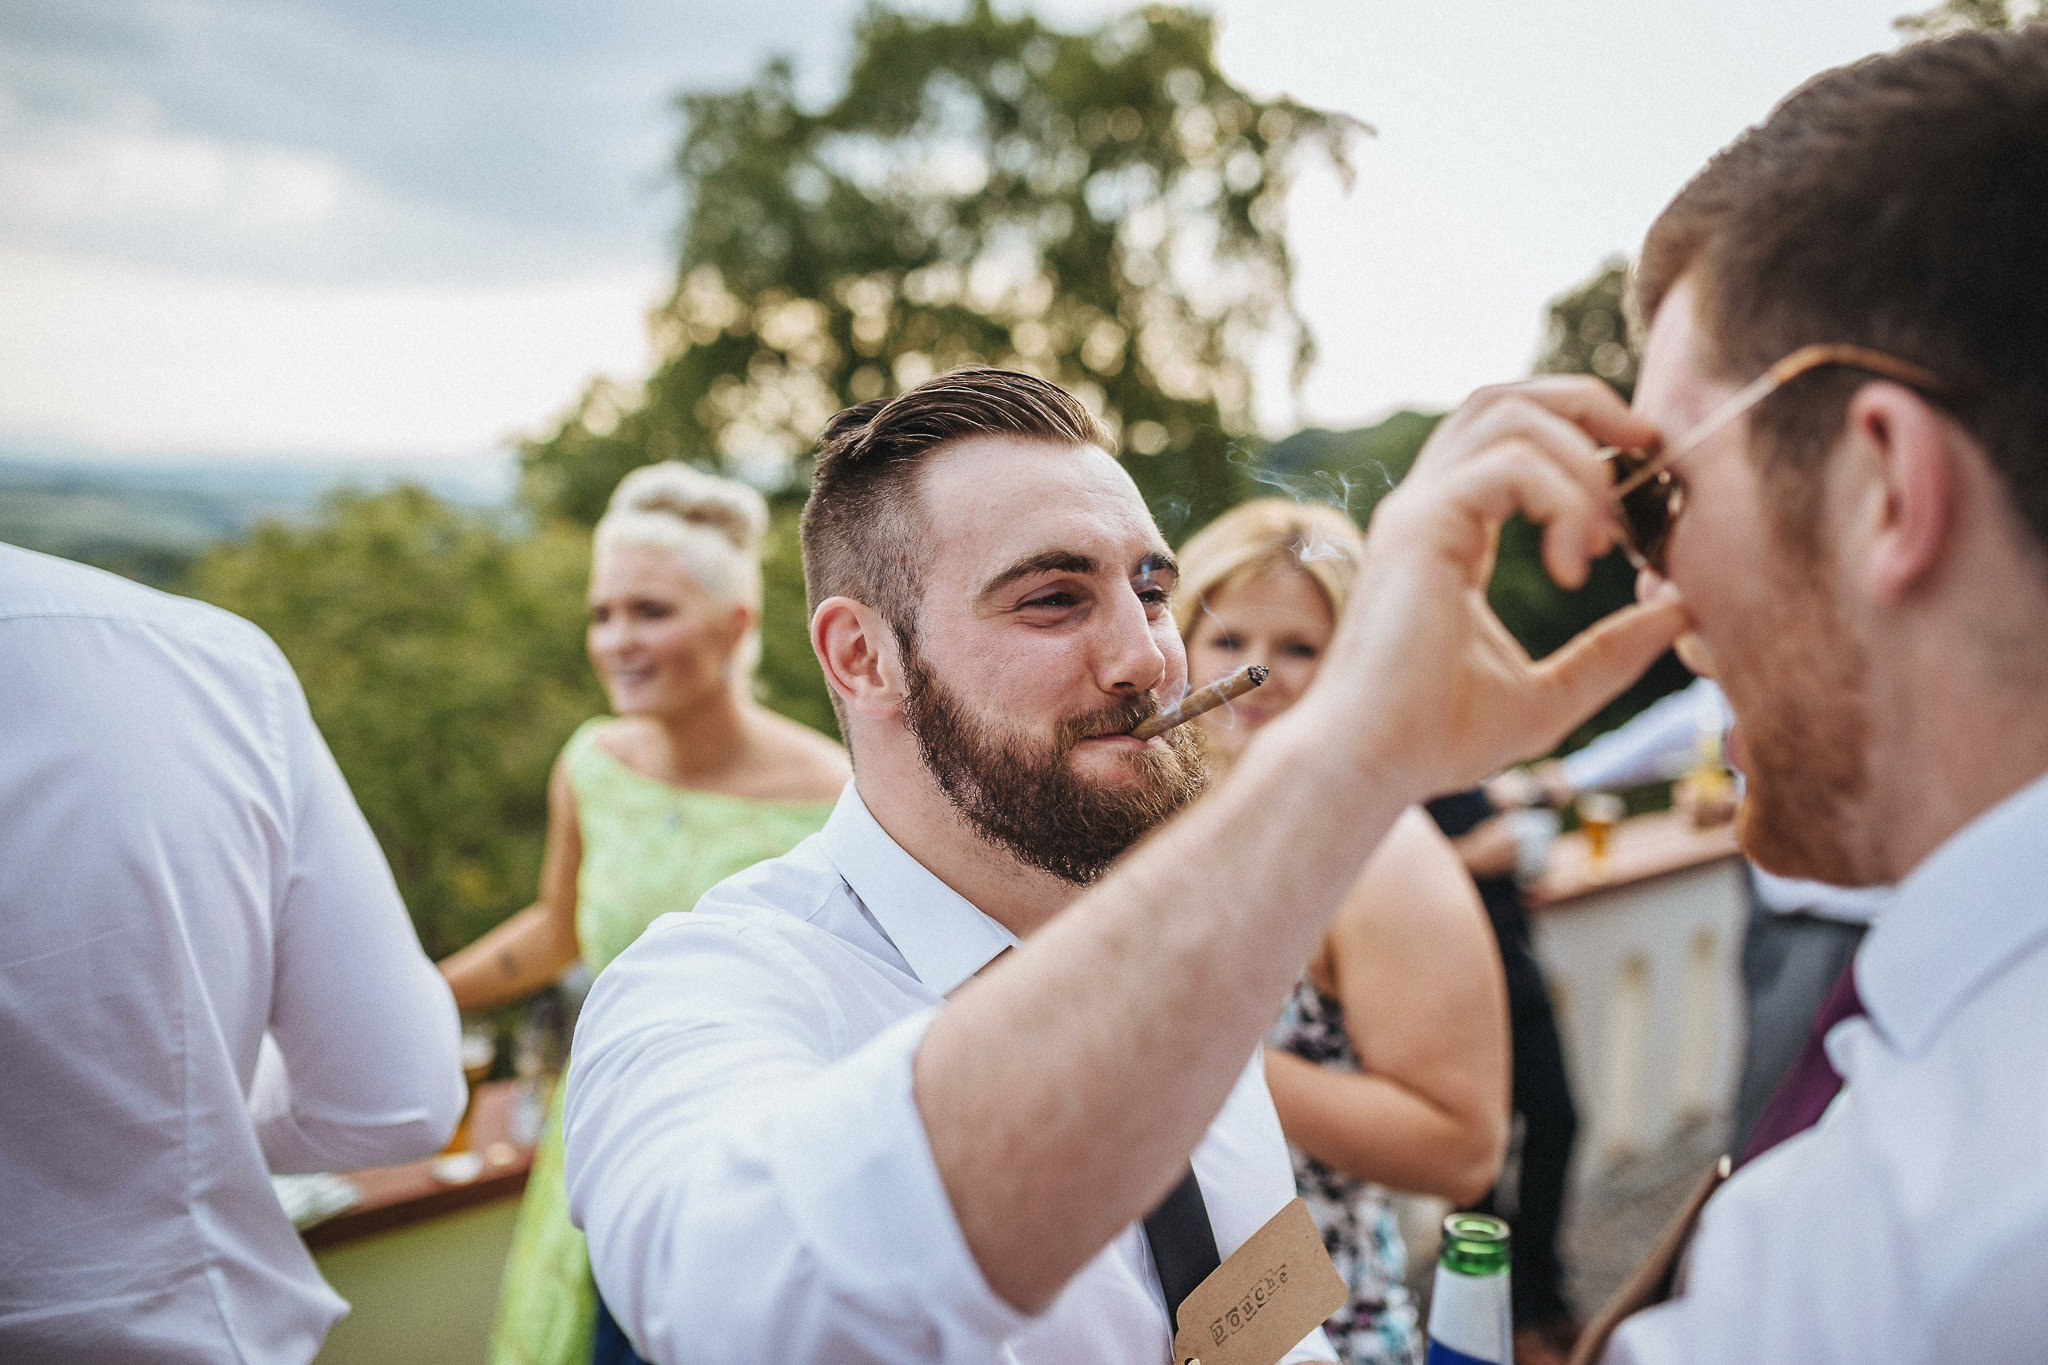 paul-marbrook-Caer-Llan-Wedding-Photographer-90084